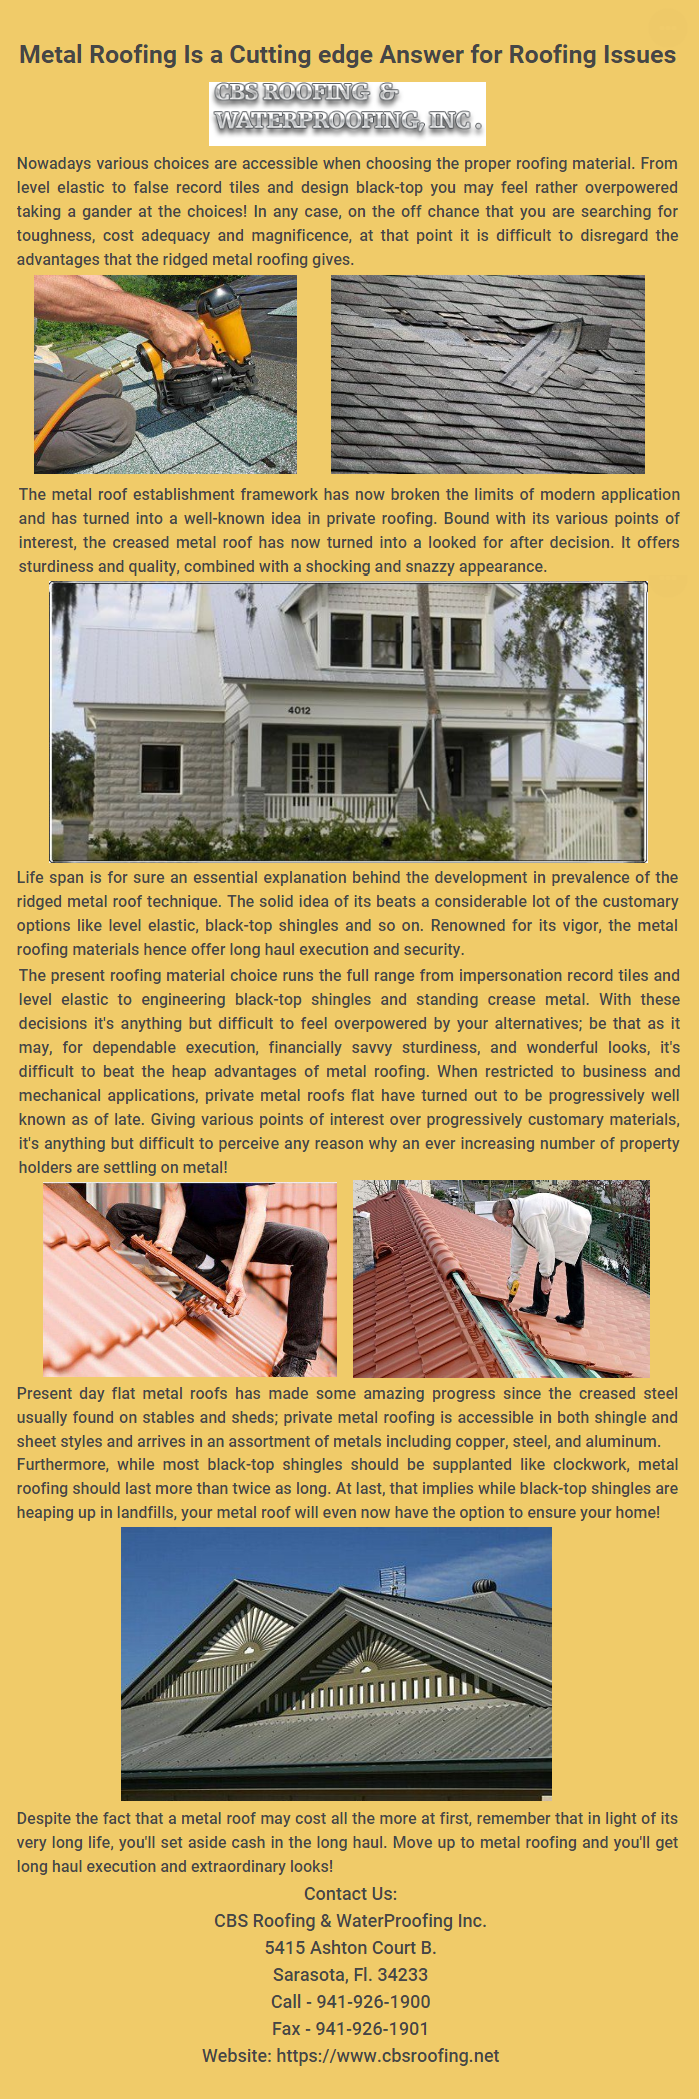 Pin On Cbs Roofing Waterproofing Inc